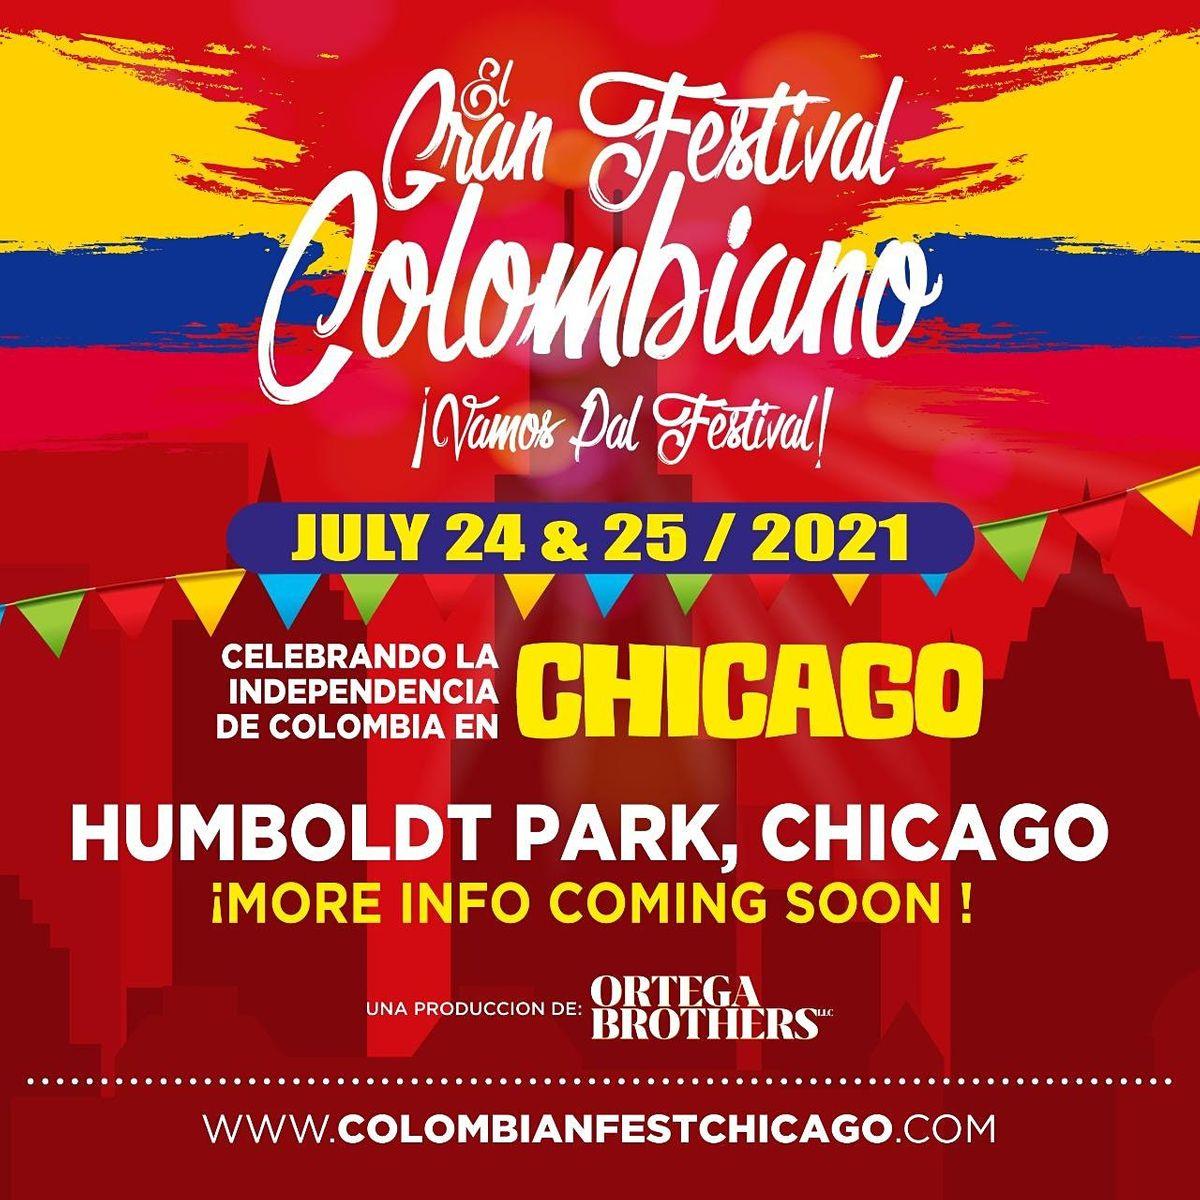 CHICAGO'S  COLOMBIAN FEST\/ GRAN FESTIVAL COLOMBIANO